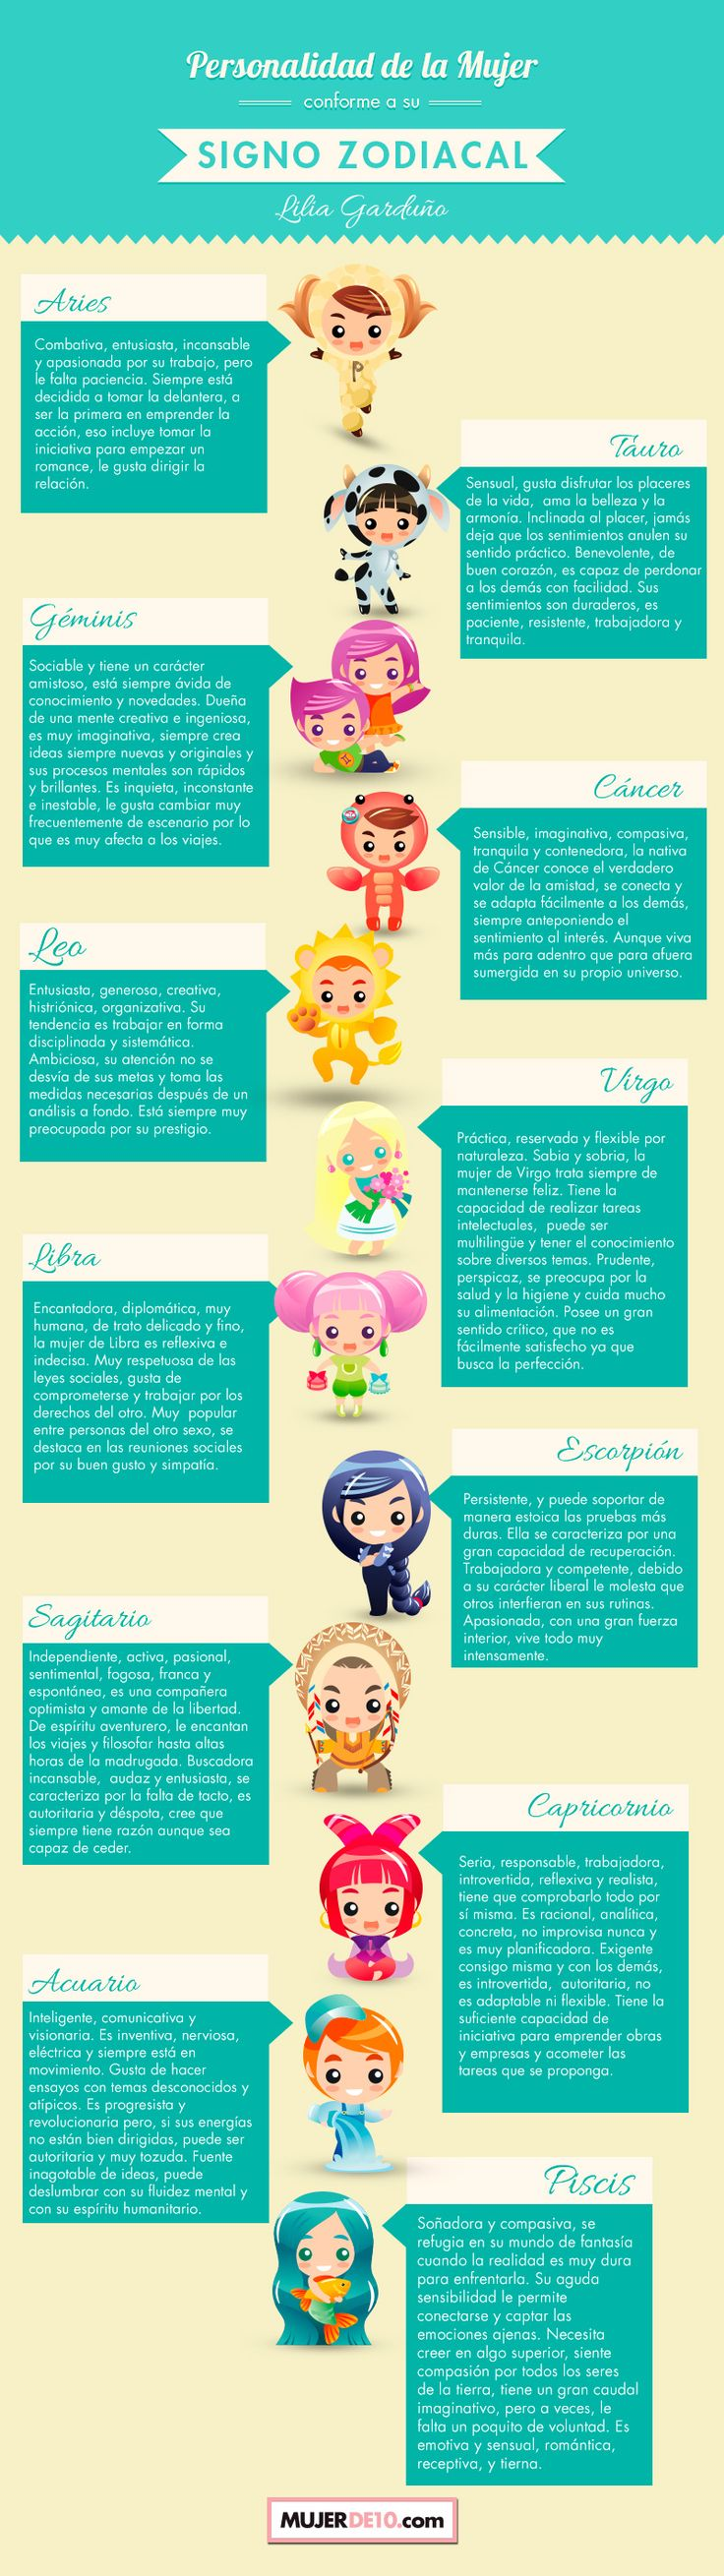 Tu personalidad según tu signo zodiacal.